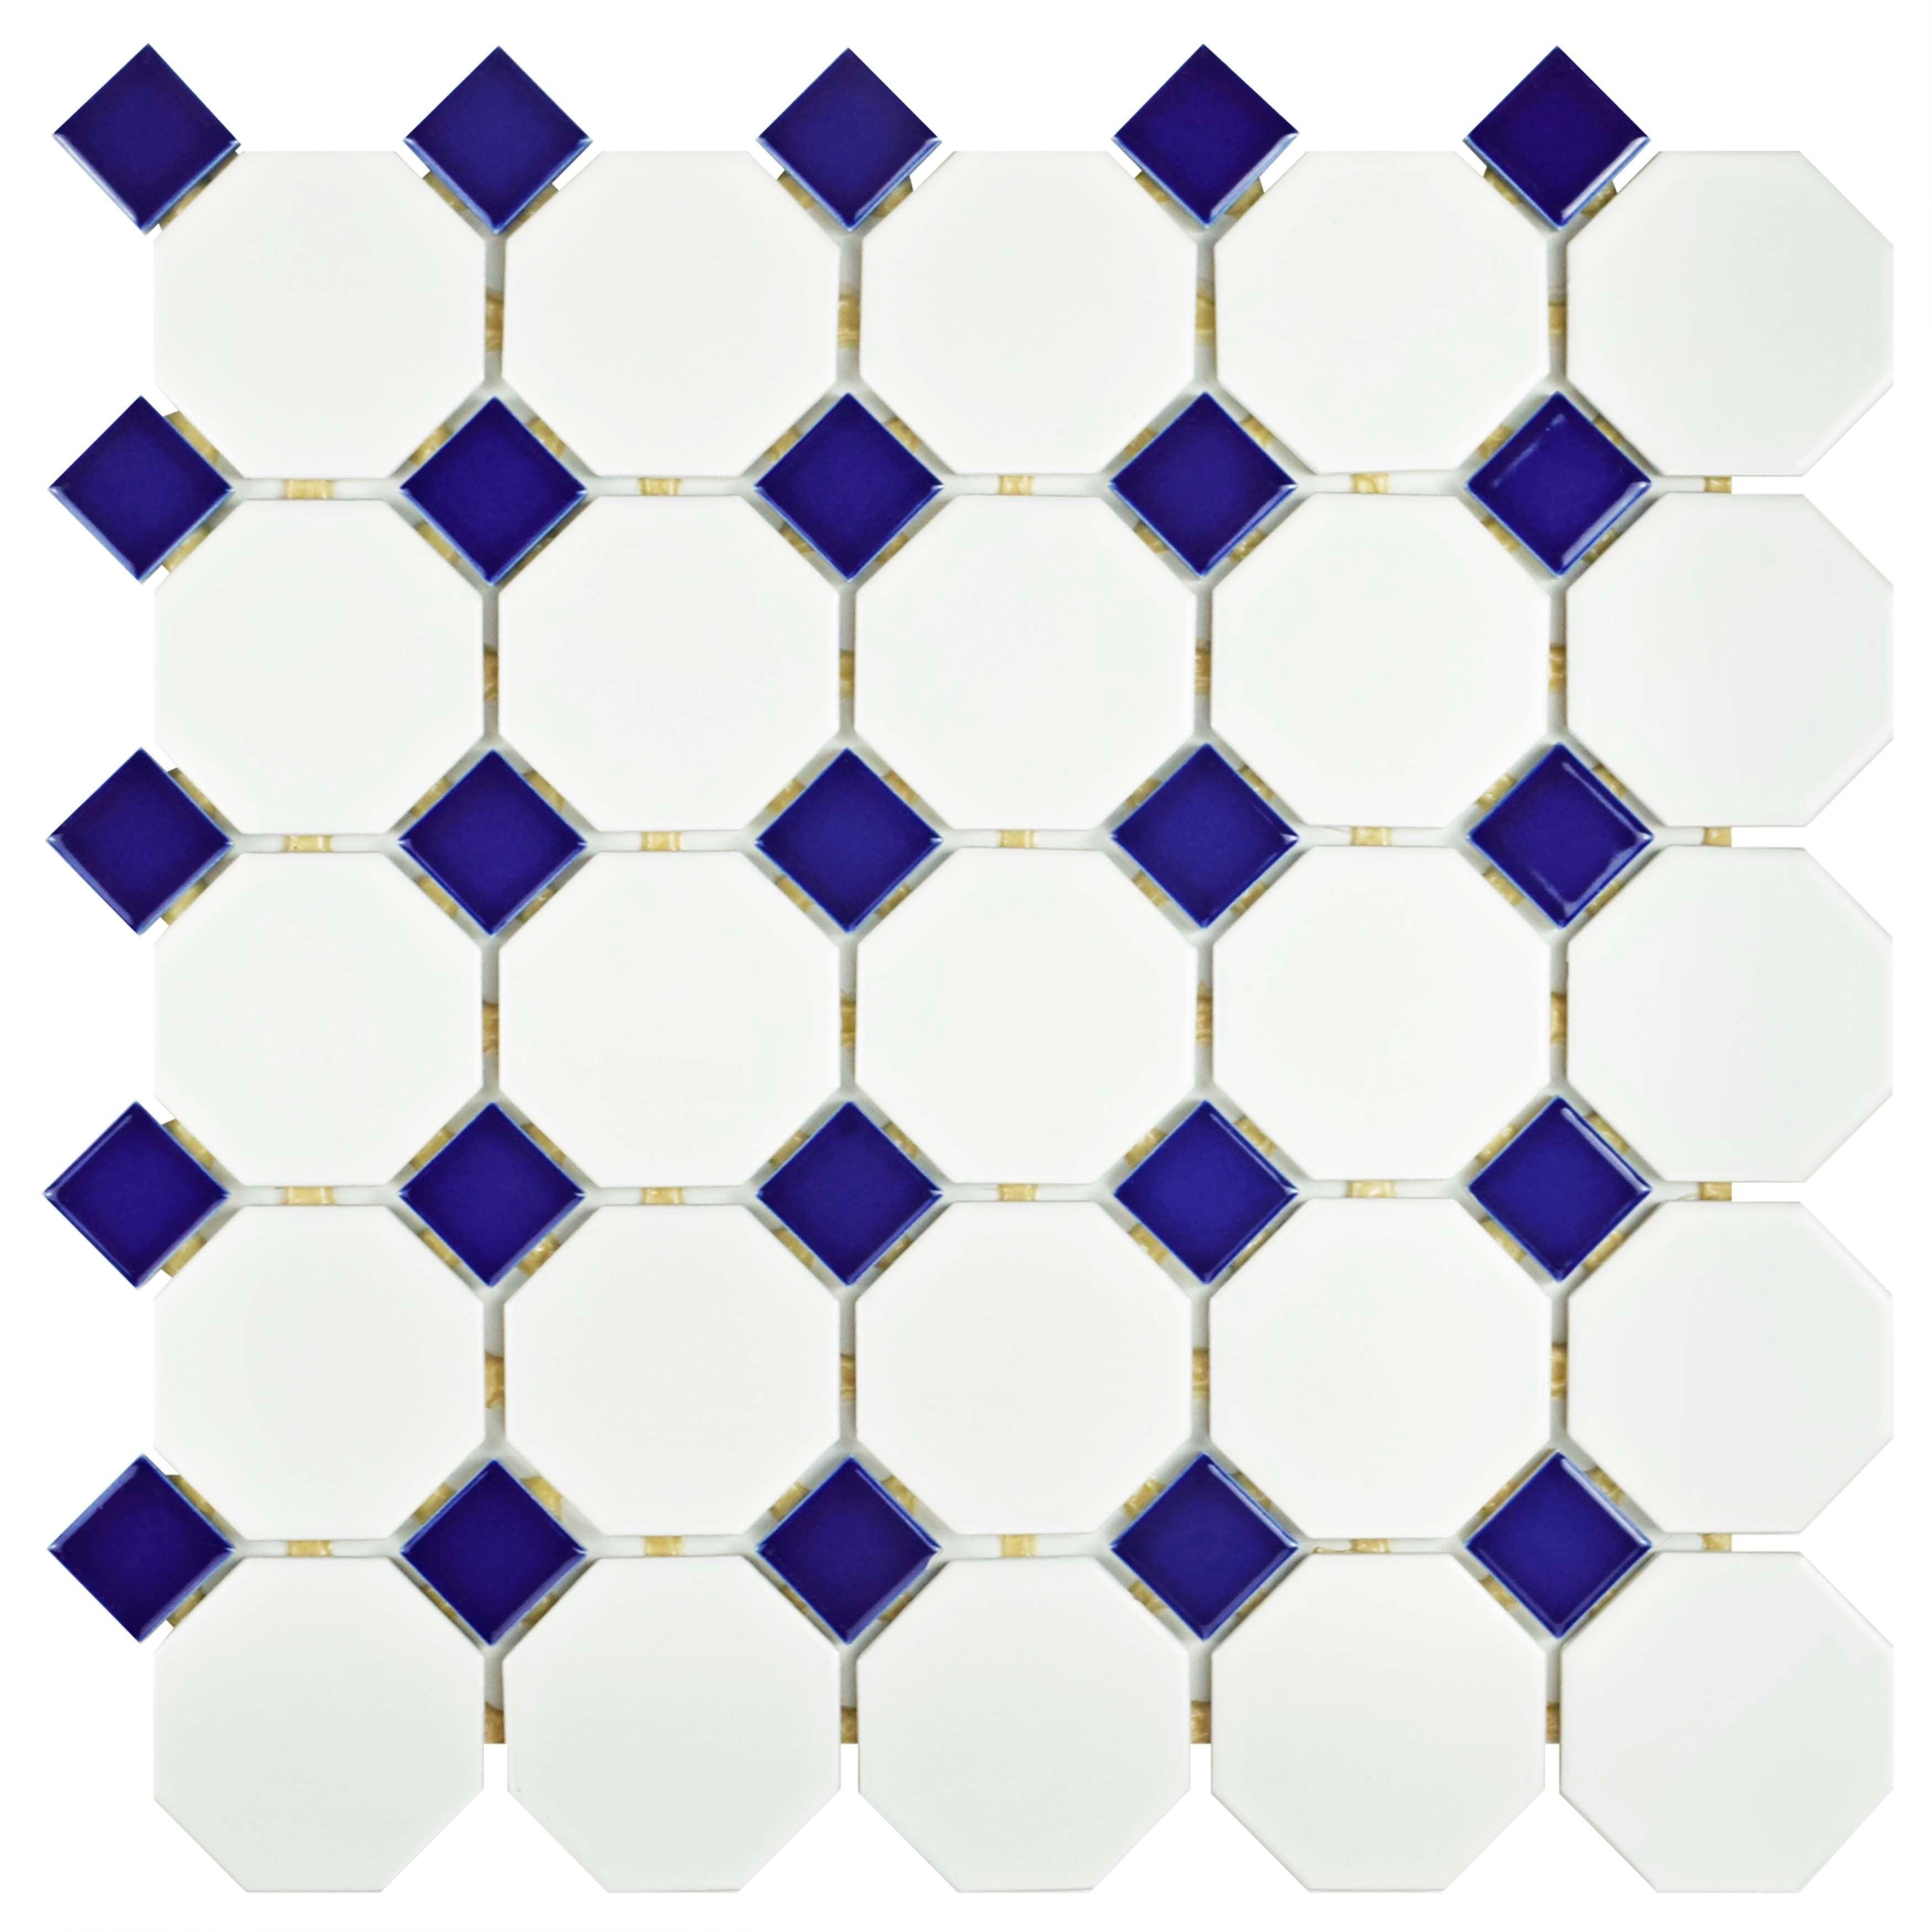 SomerTile FVVFAVH Tile 11 Piece 11.5 x 11.5